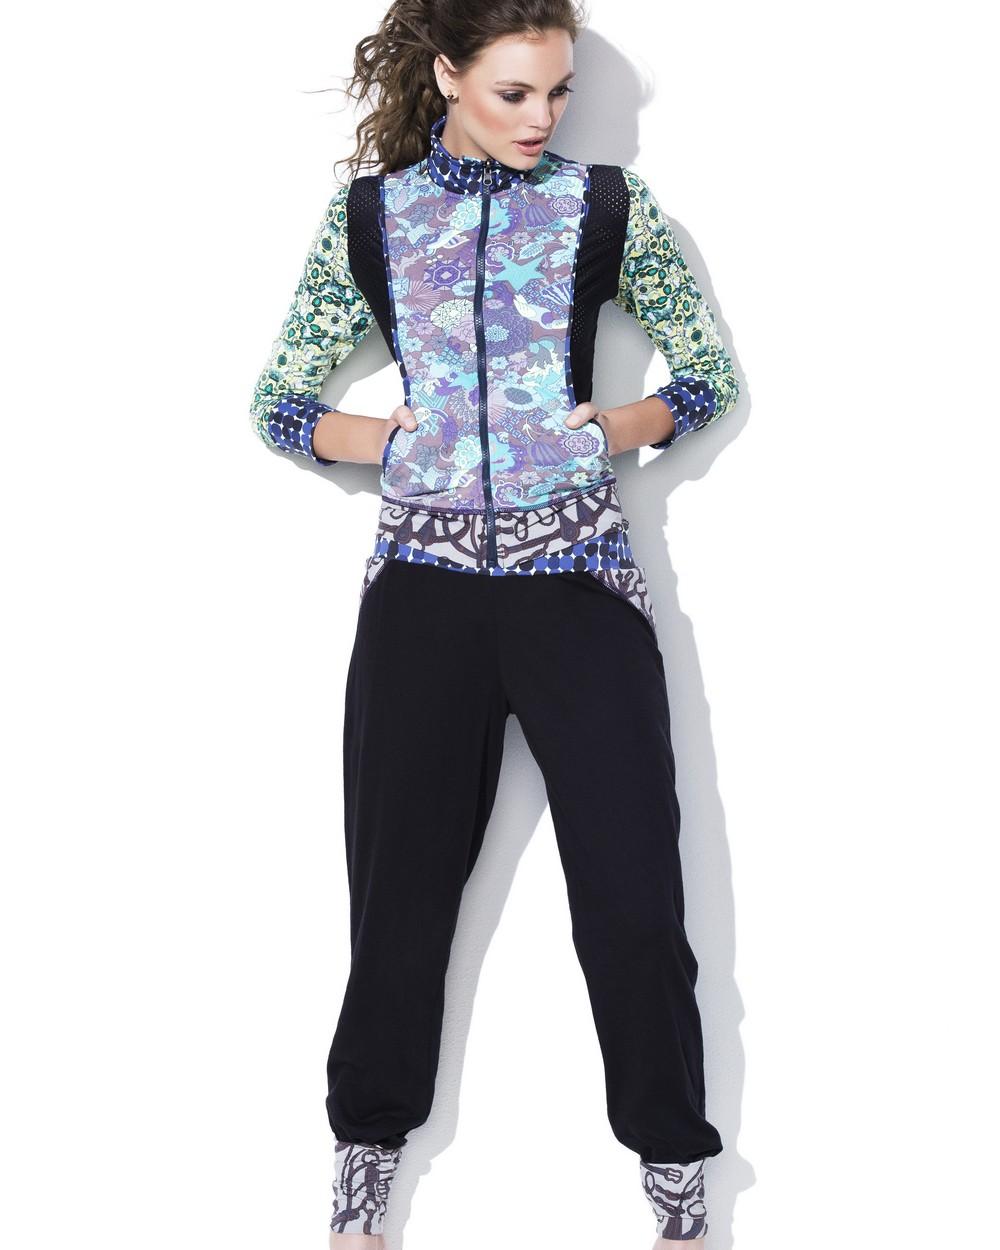 2015 Maaji Studio Activewear Dazzling Dark Yoga Pants